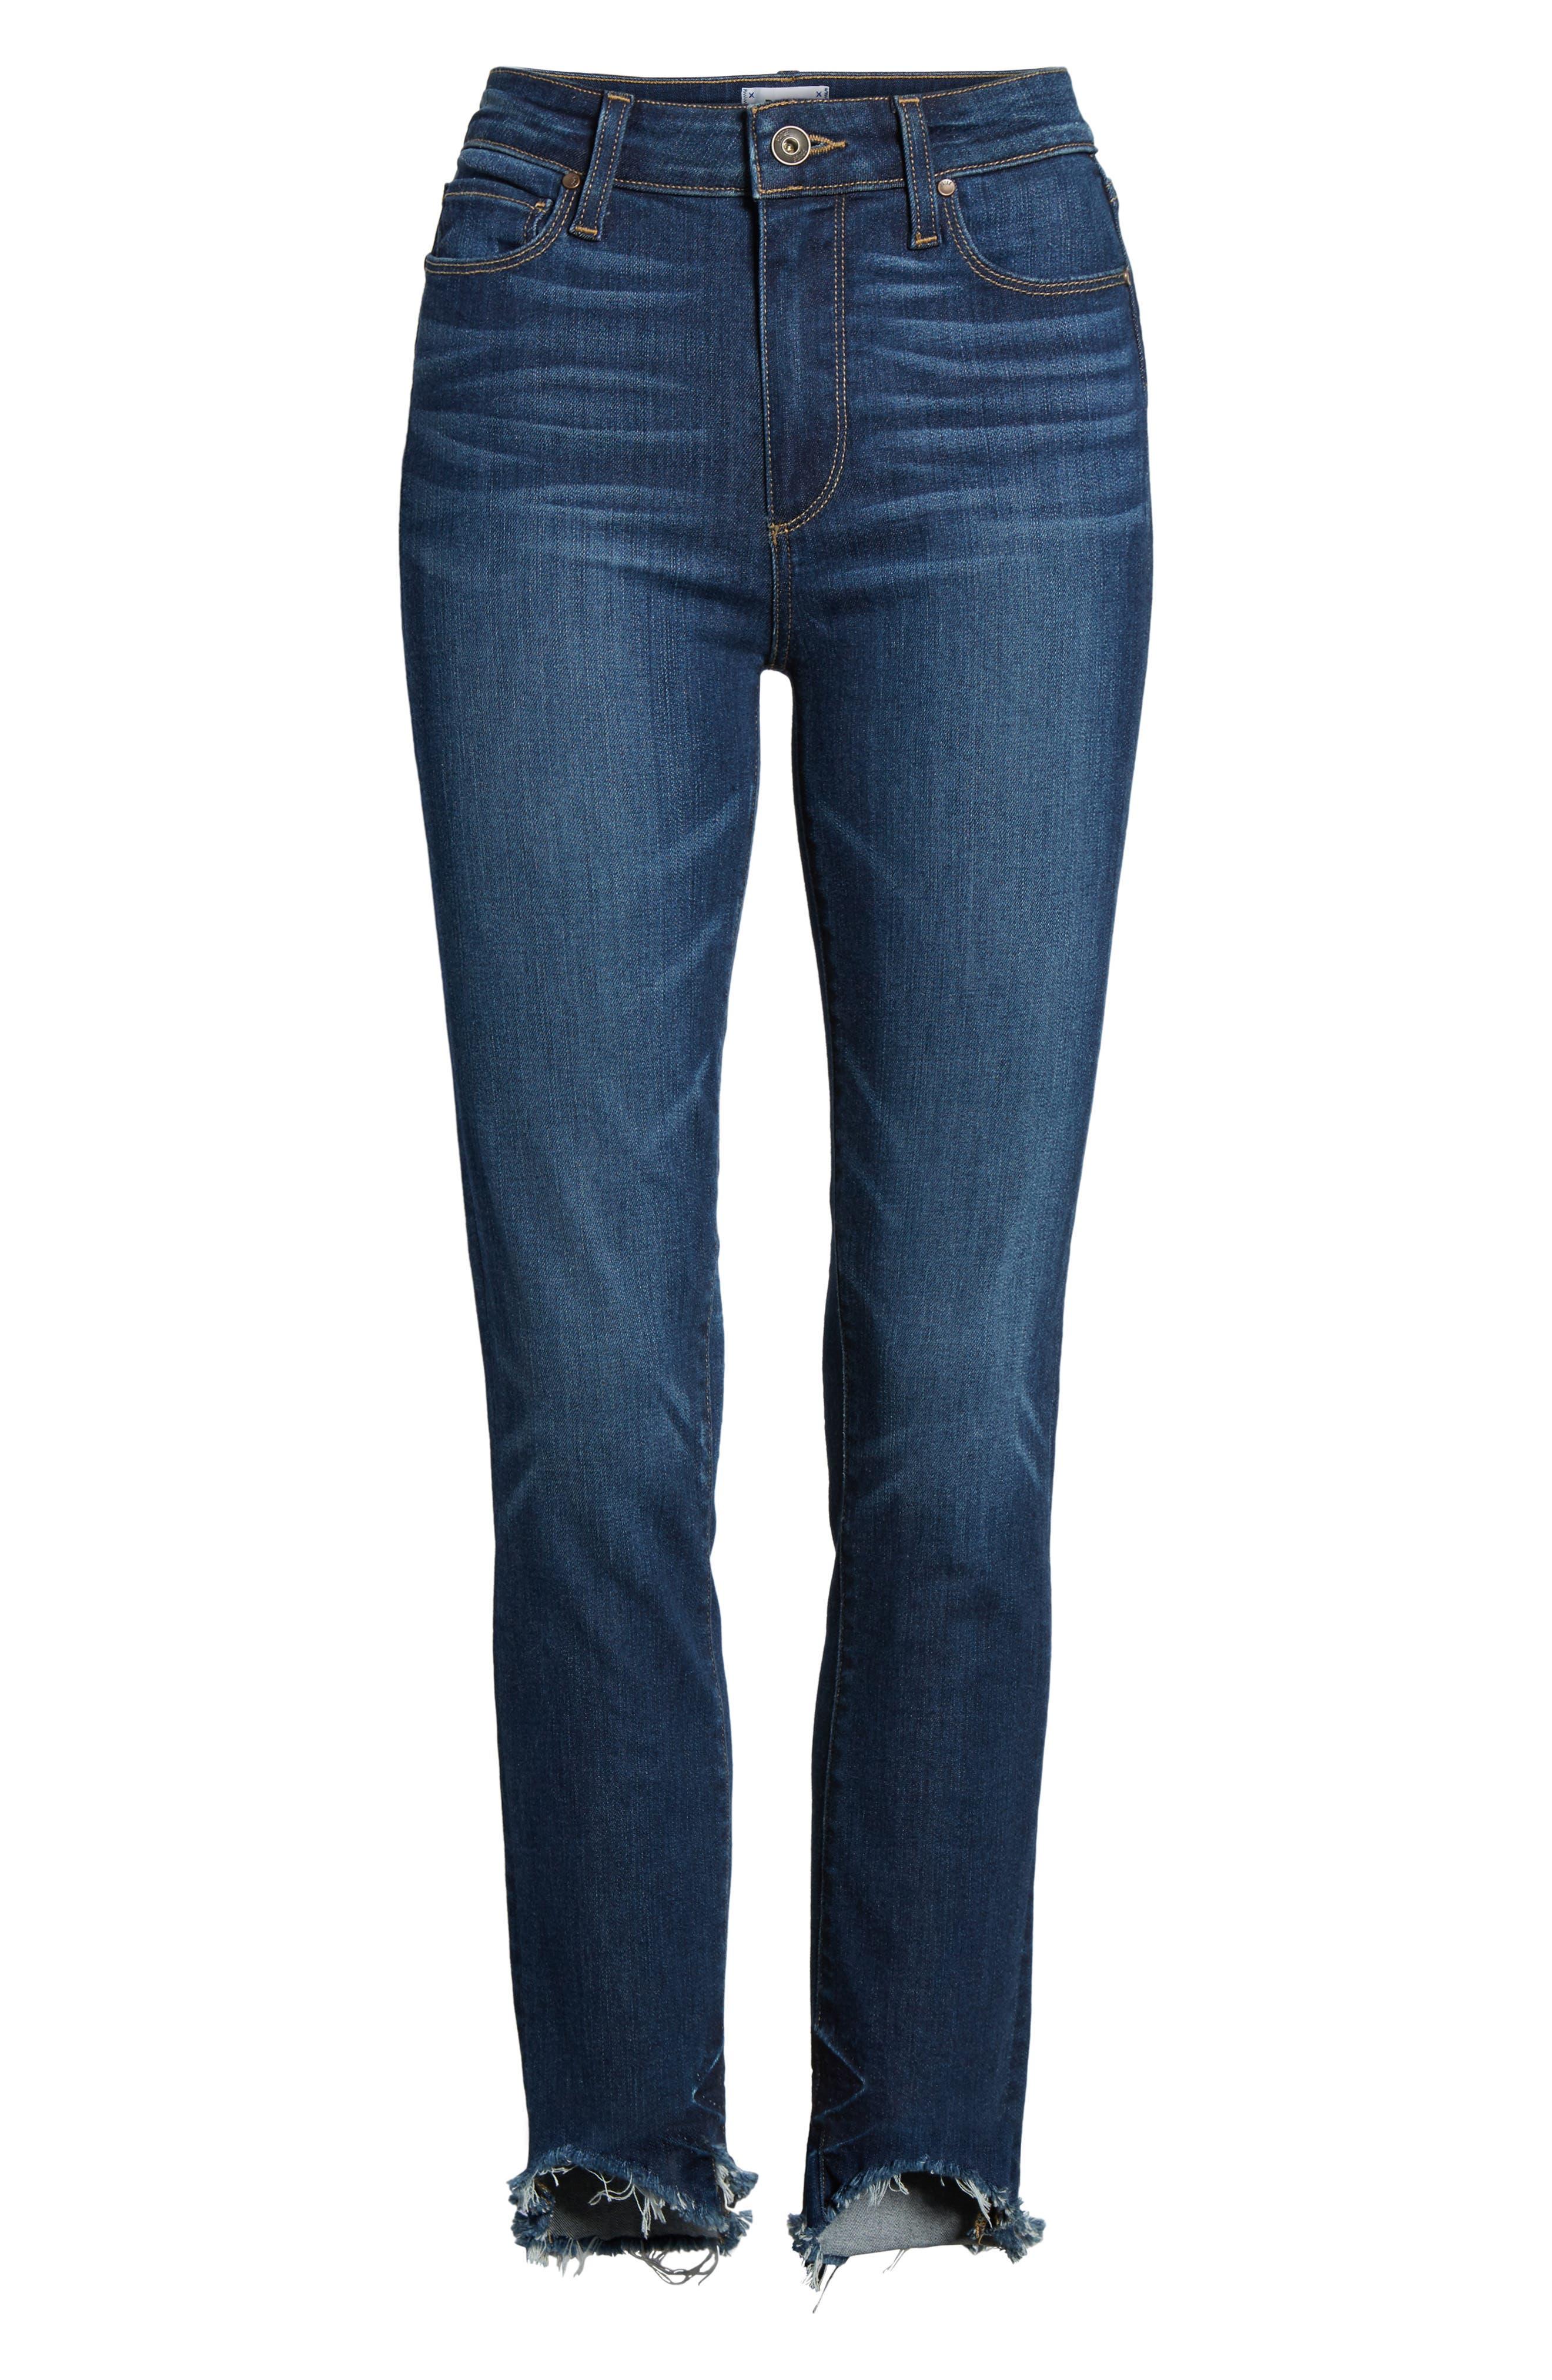 Transcend Vintage - Hoxton High Waist Ankle Skinny Jeans,                             Alternate thumbnail 6, color,